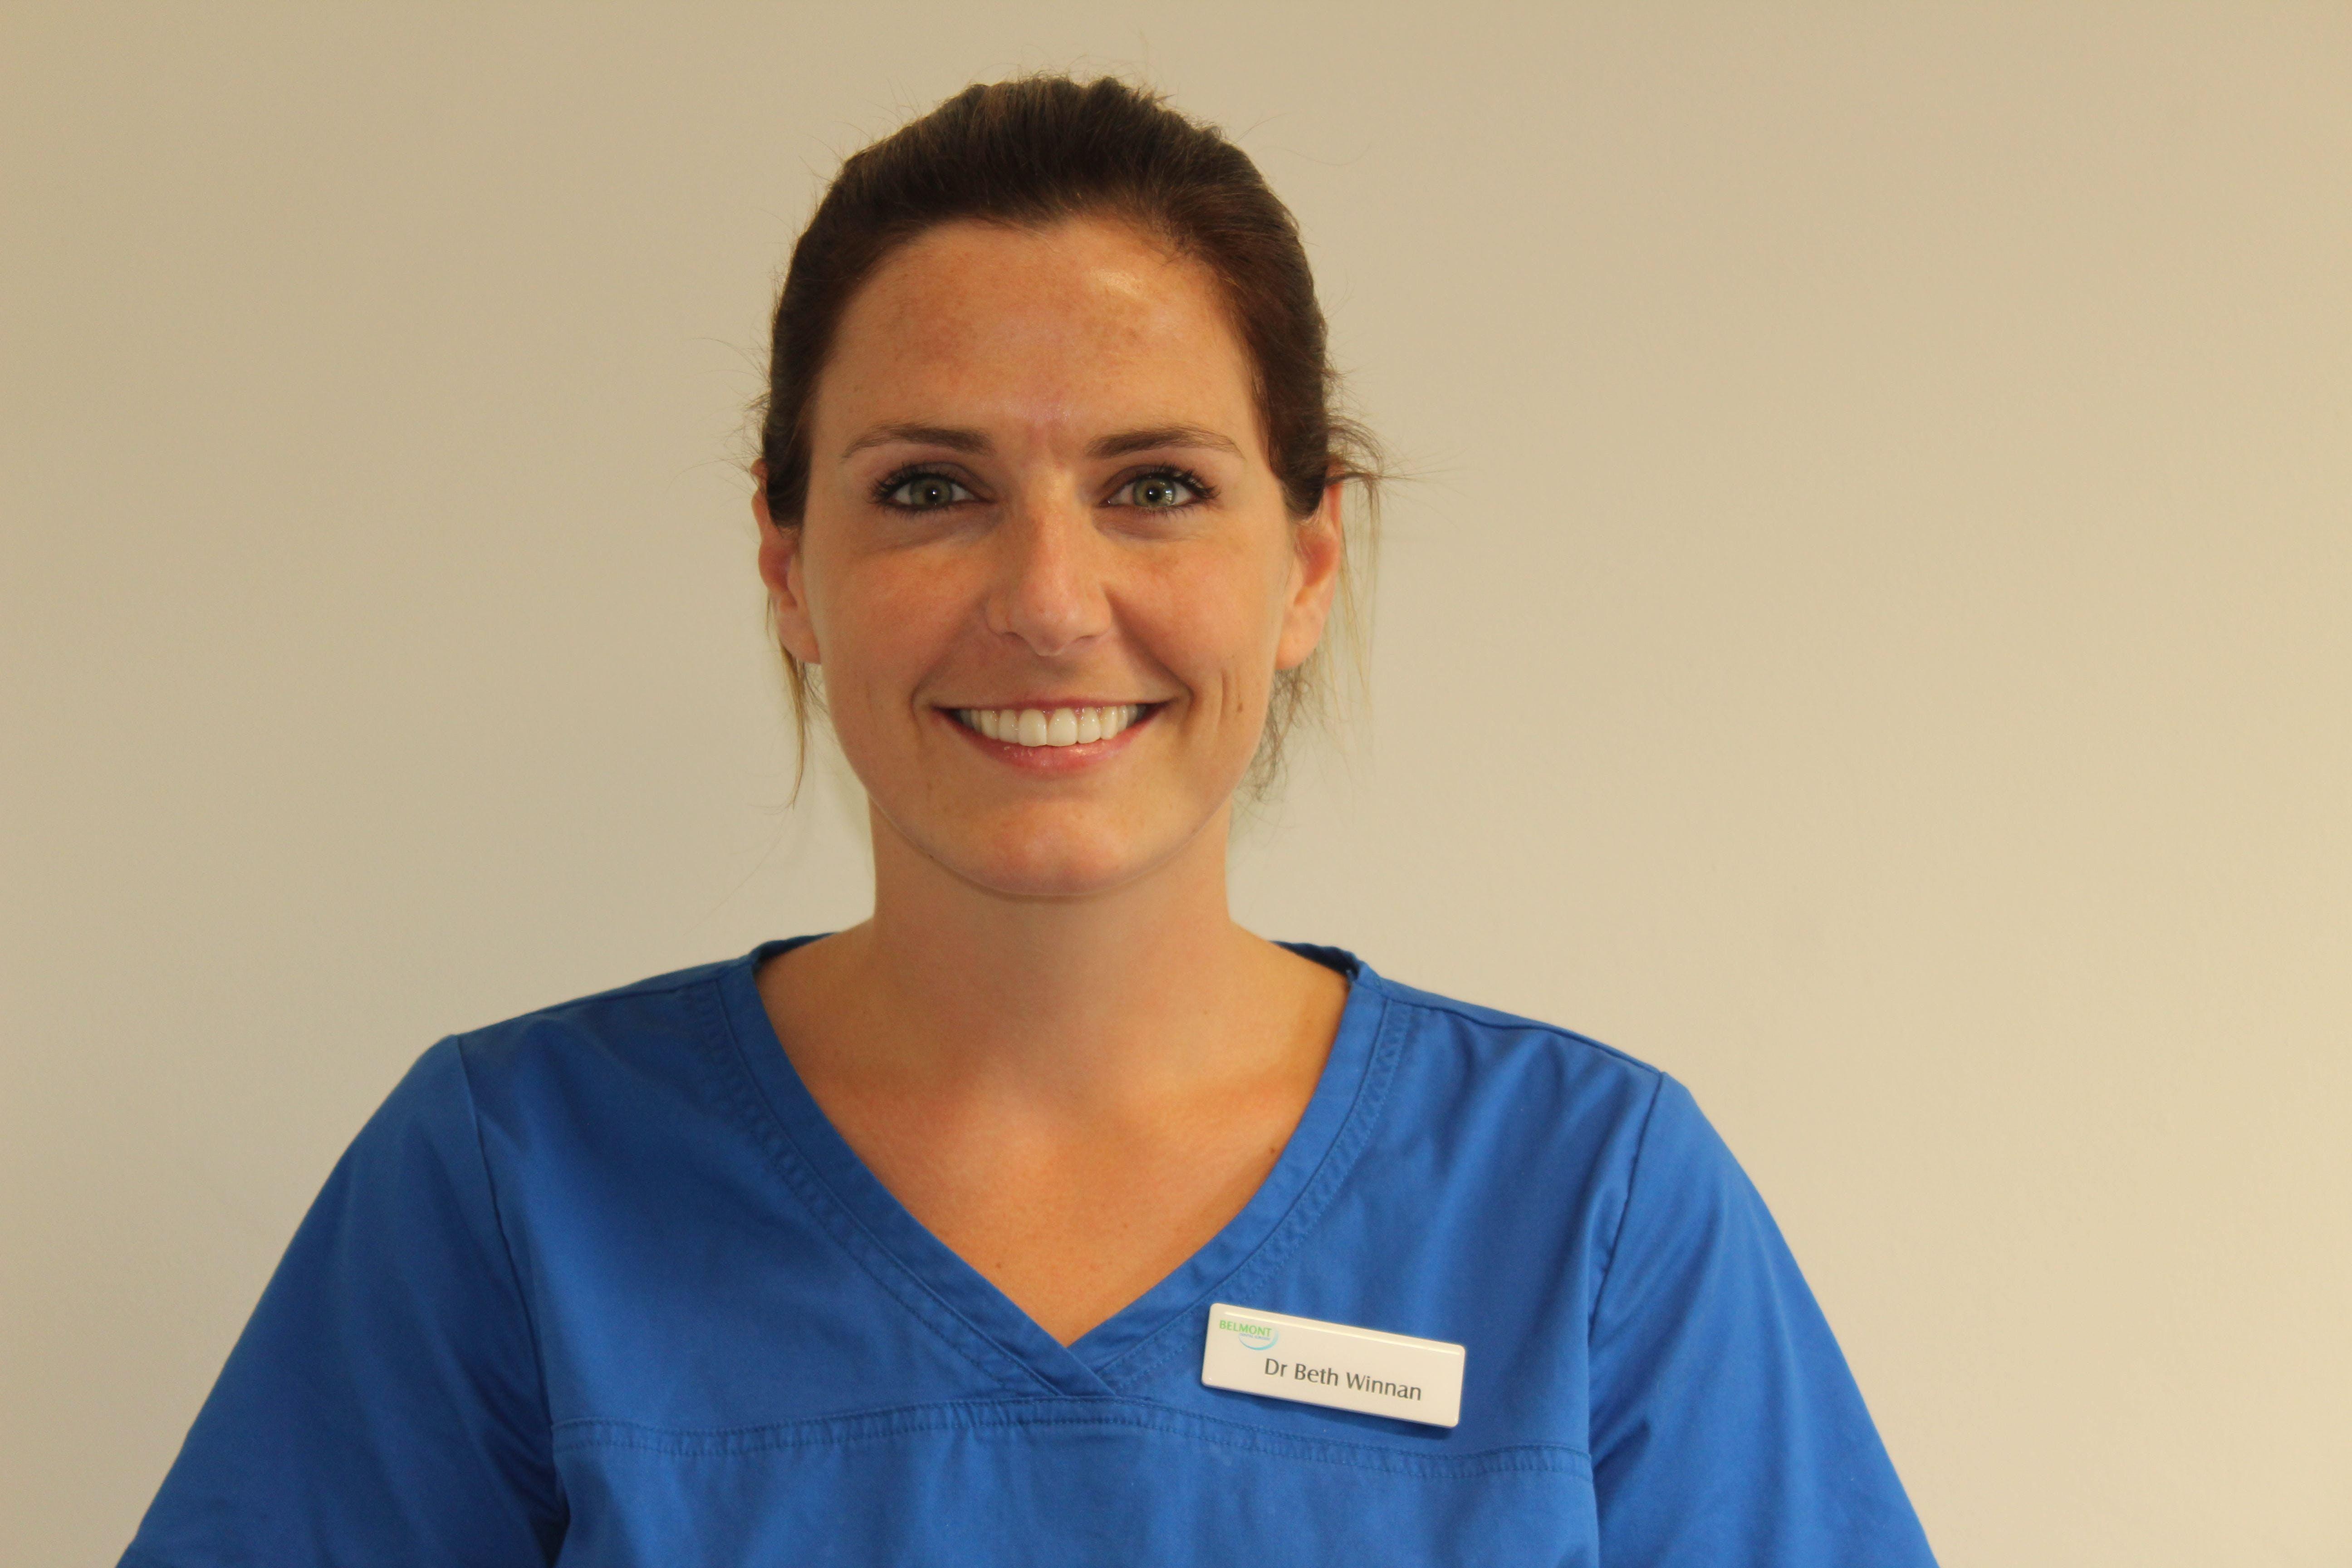 Photo of Dr Beth Winnan